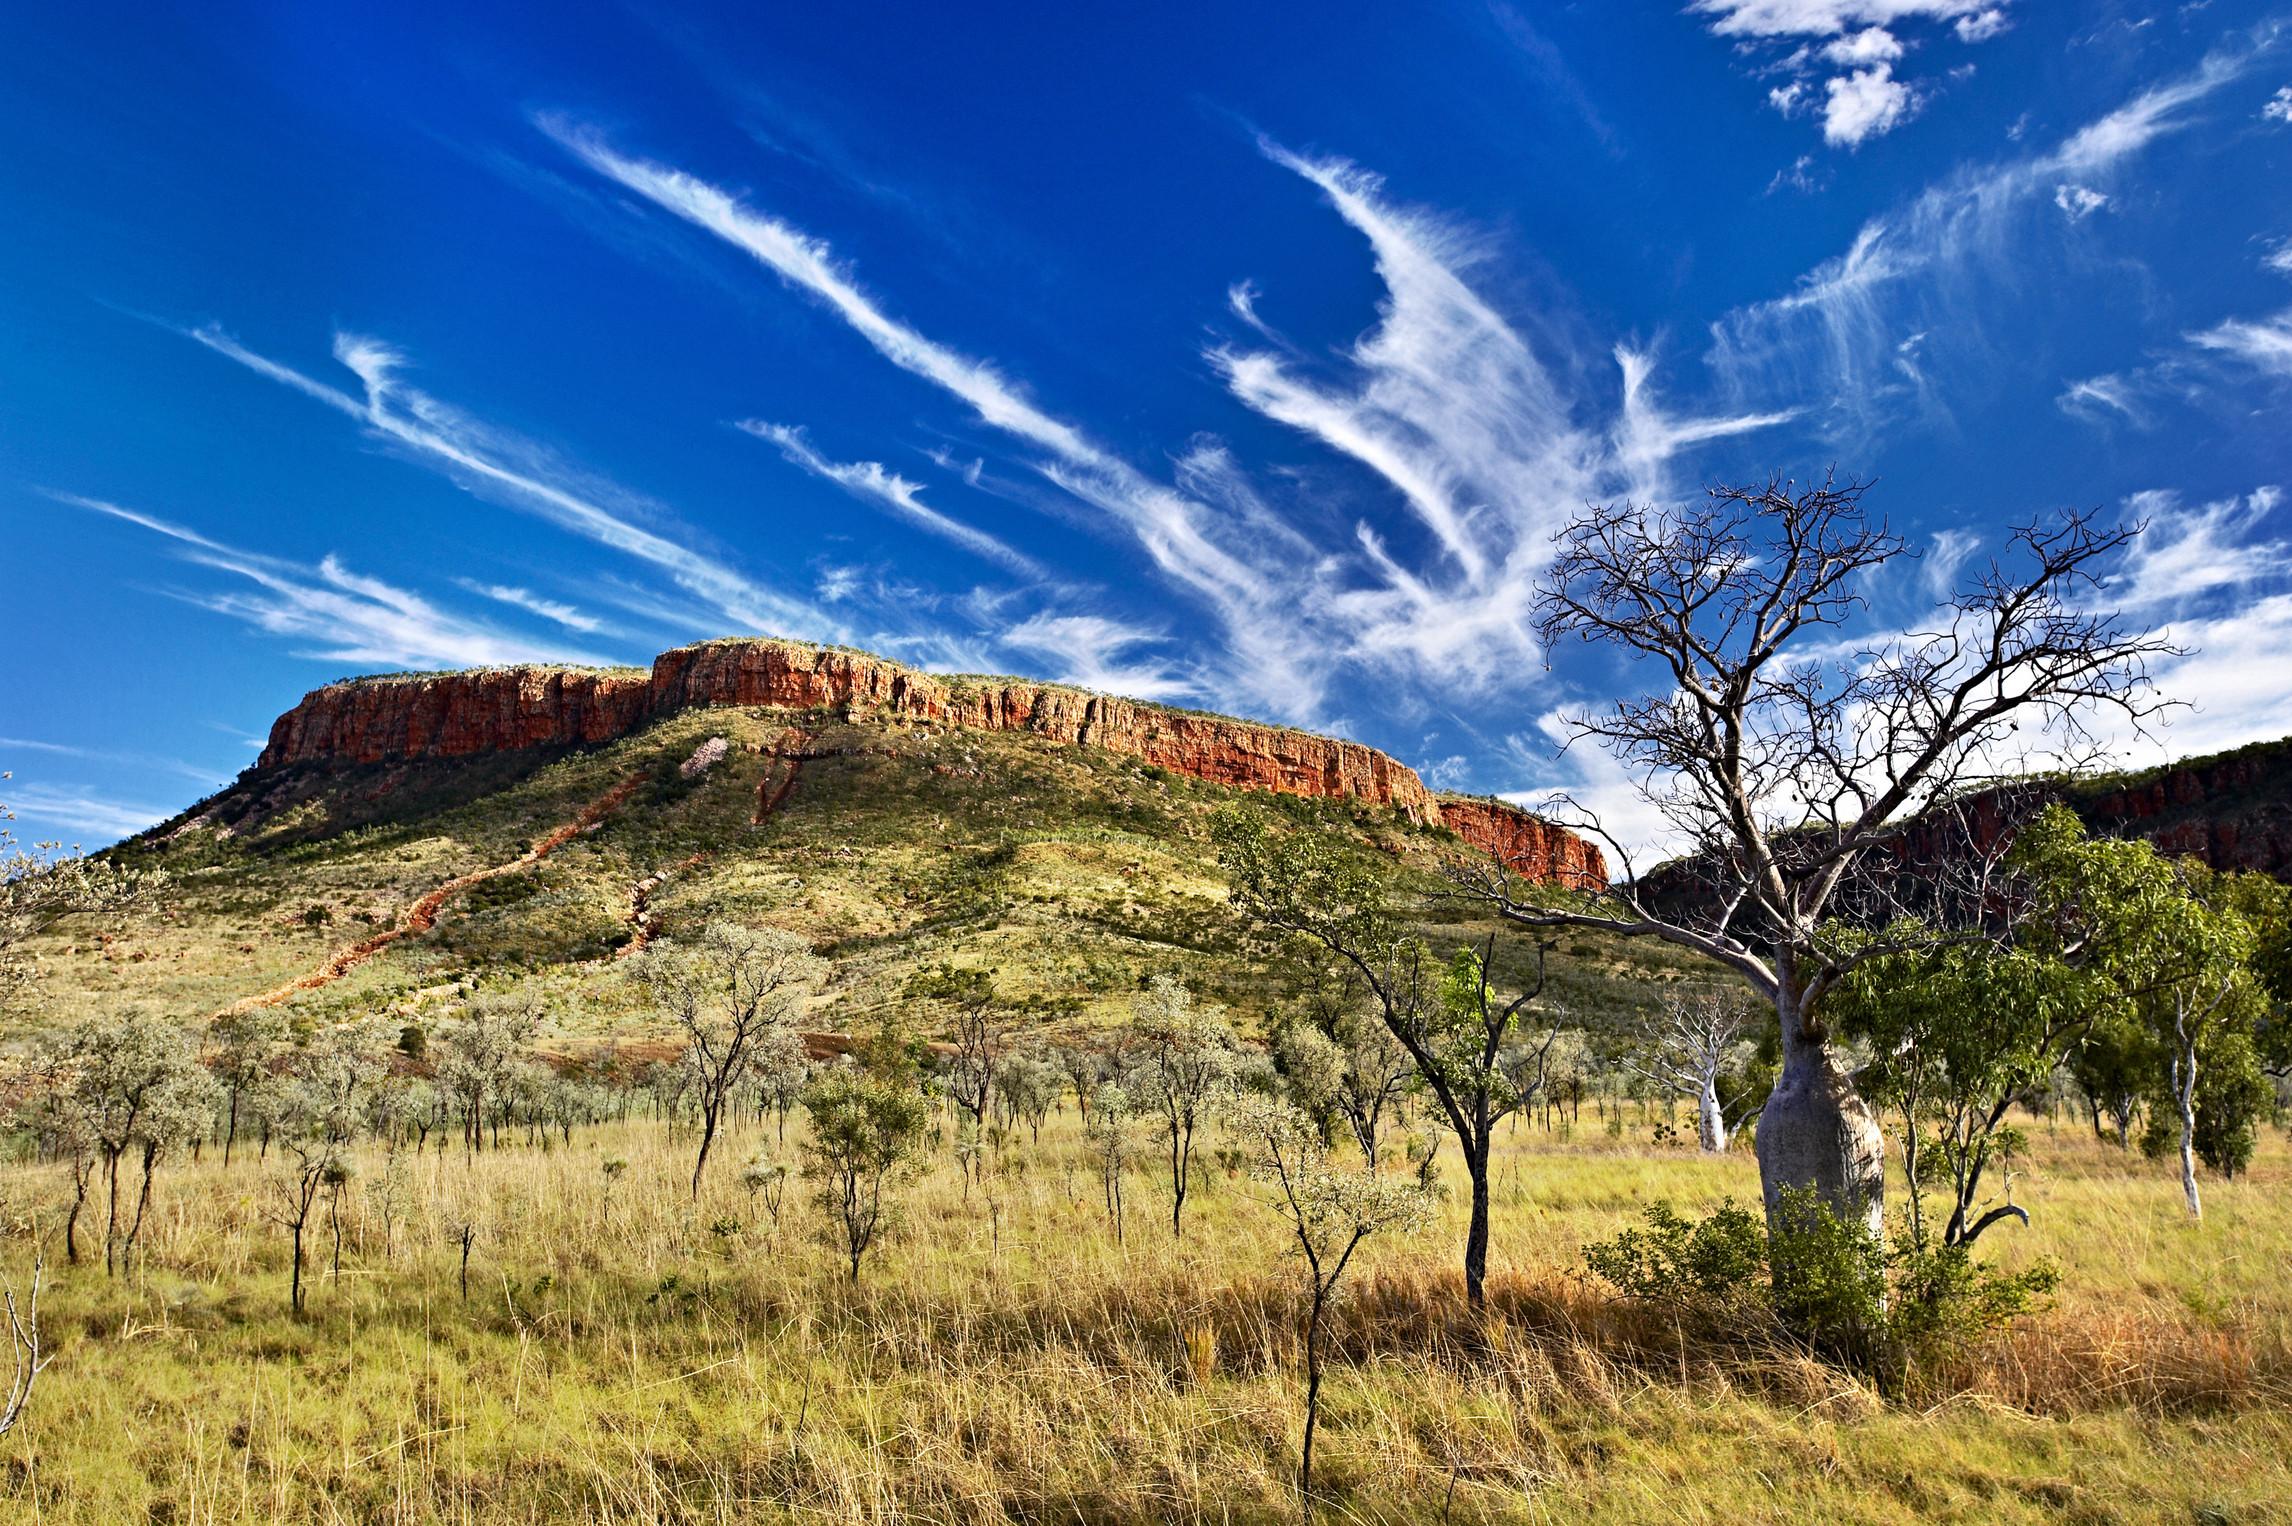 Cockburn Range, El Questro, Kimberley, Western Australia